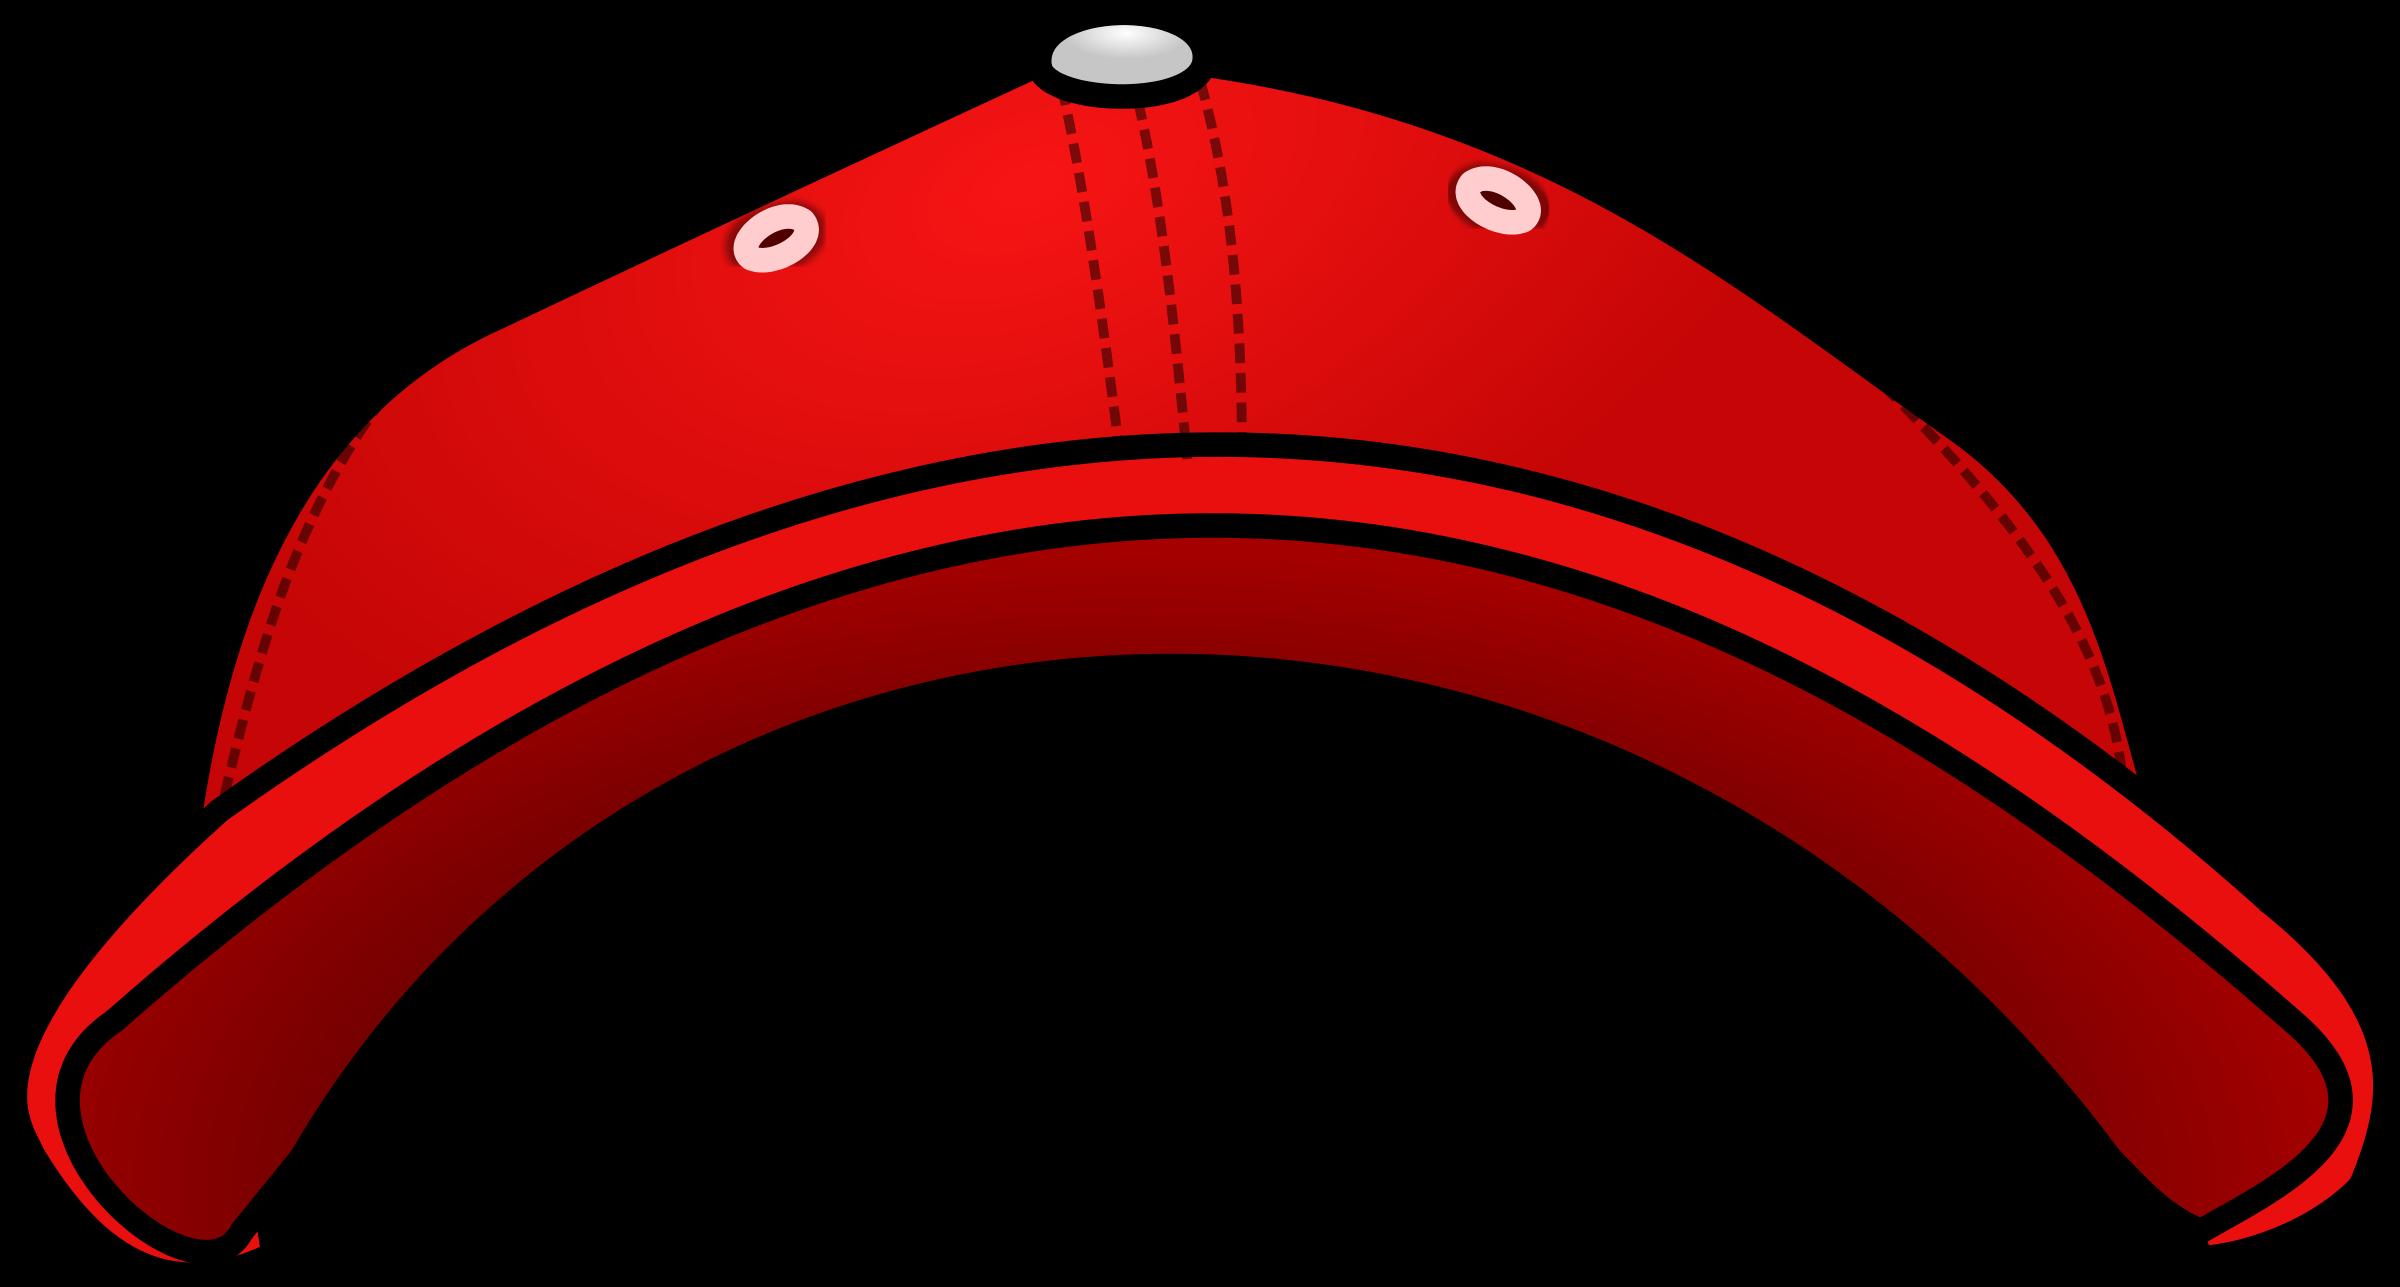 Clipart blue baseball cap backwards clip free download Image result for funny hat image   Backwards birthday party ... clip free download